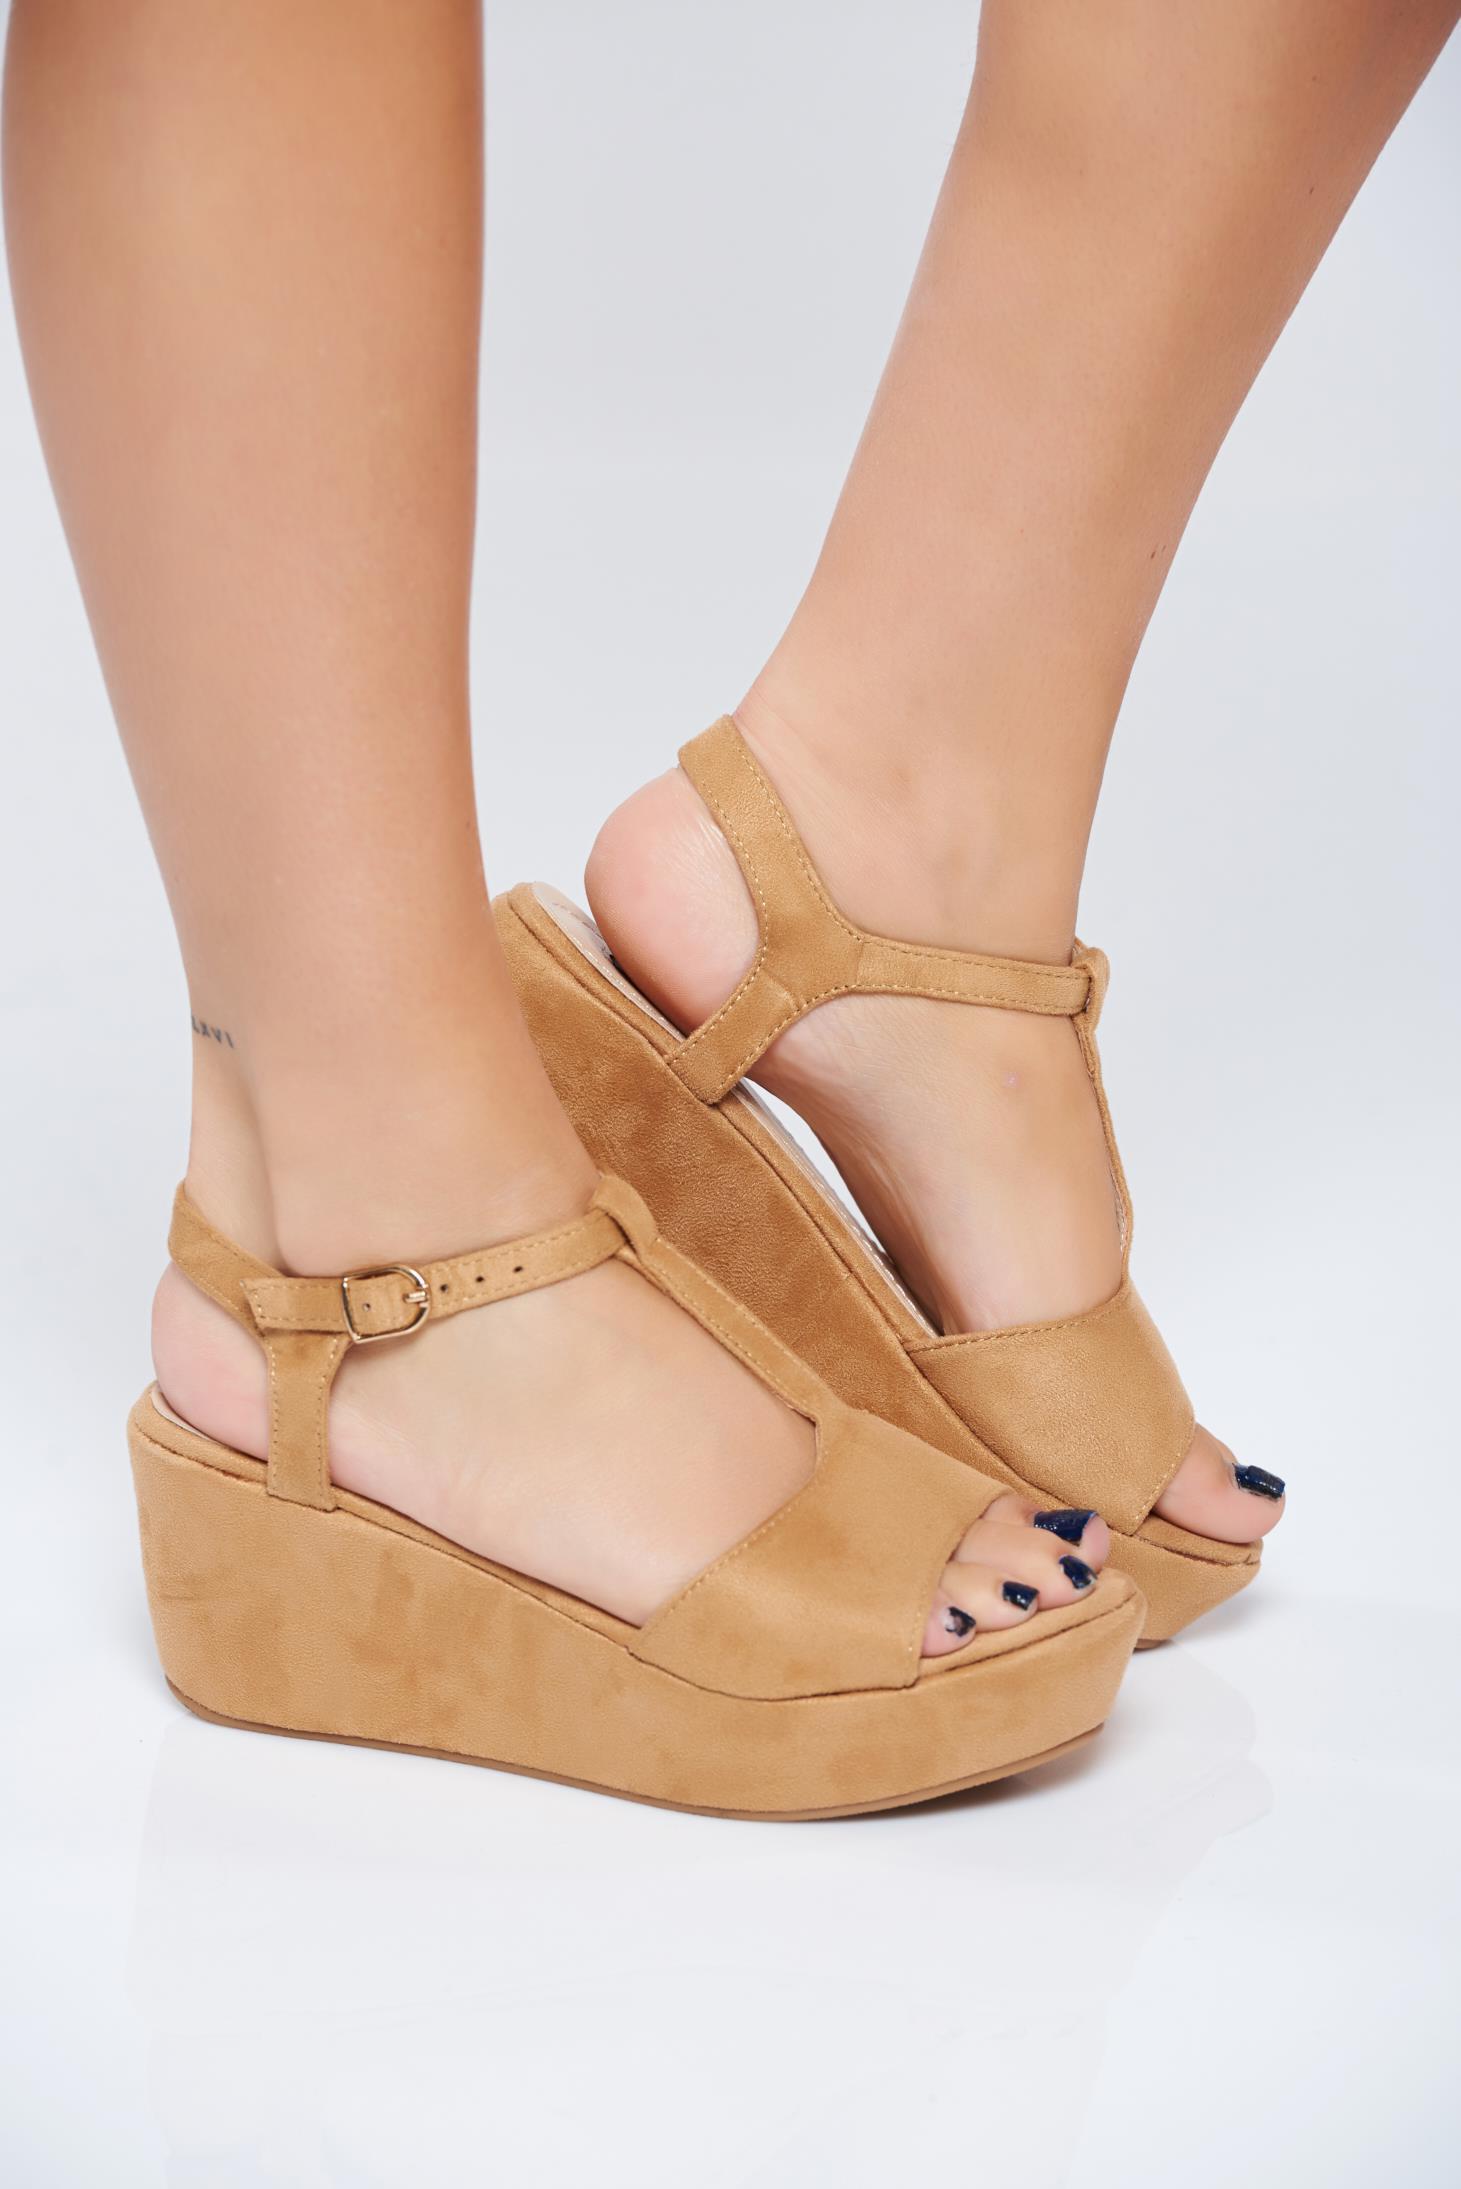 Sandale casual maro cu barete subtiri